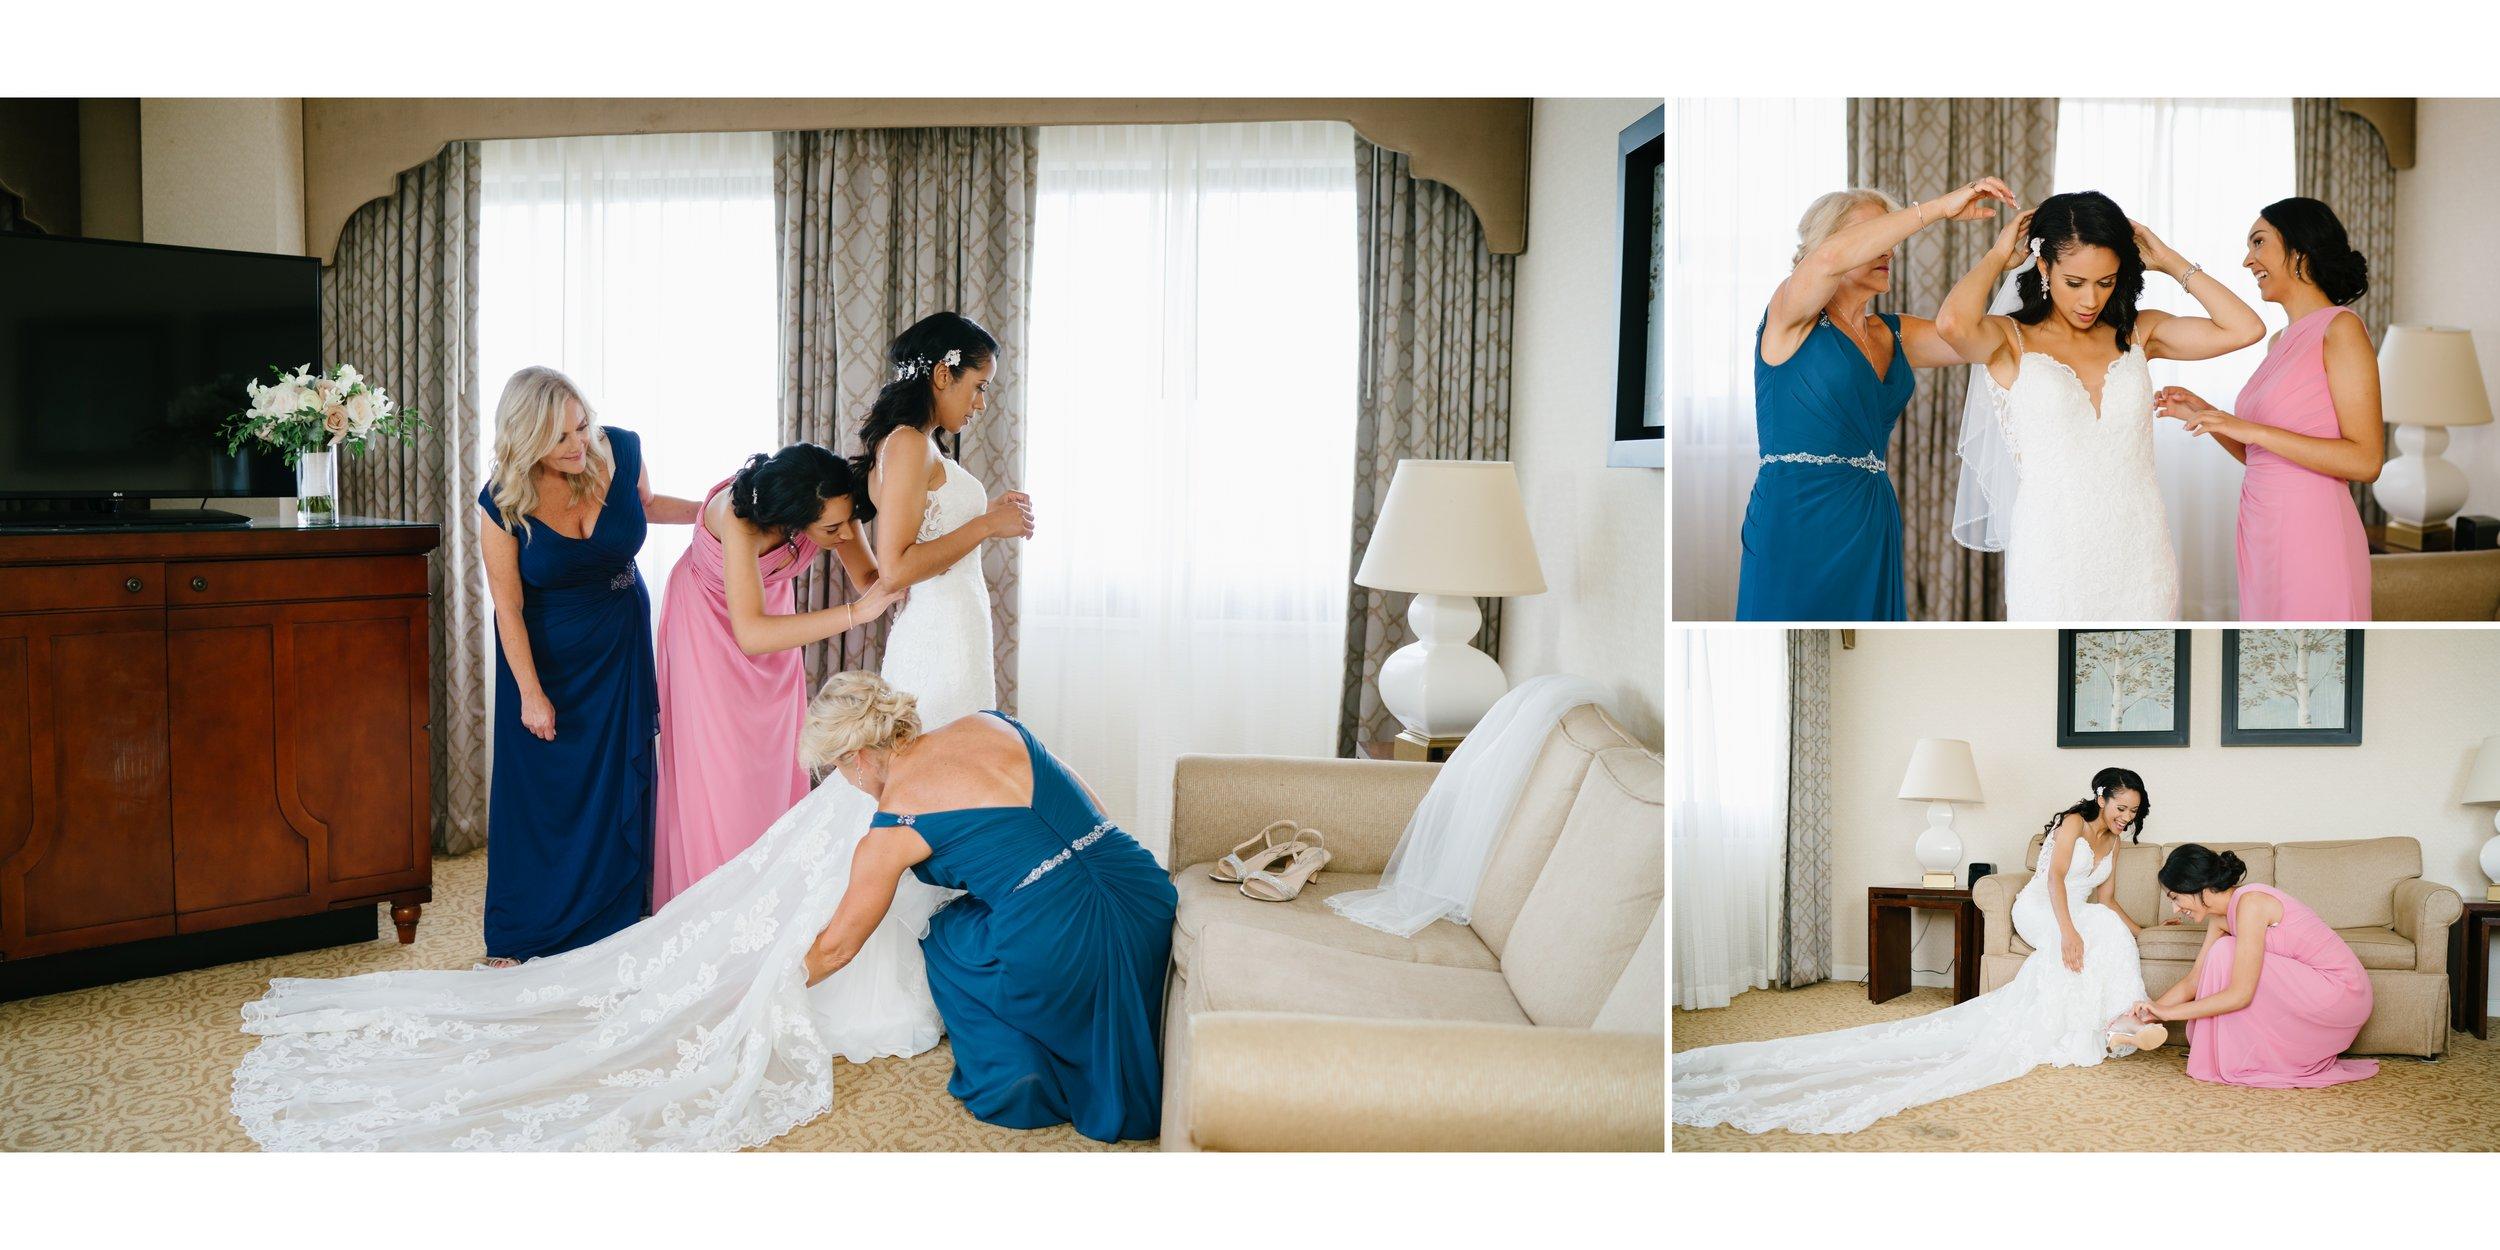 bride getting ready at wedding in los angeles wedding